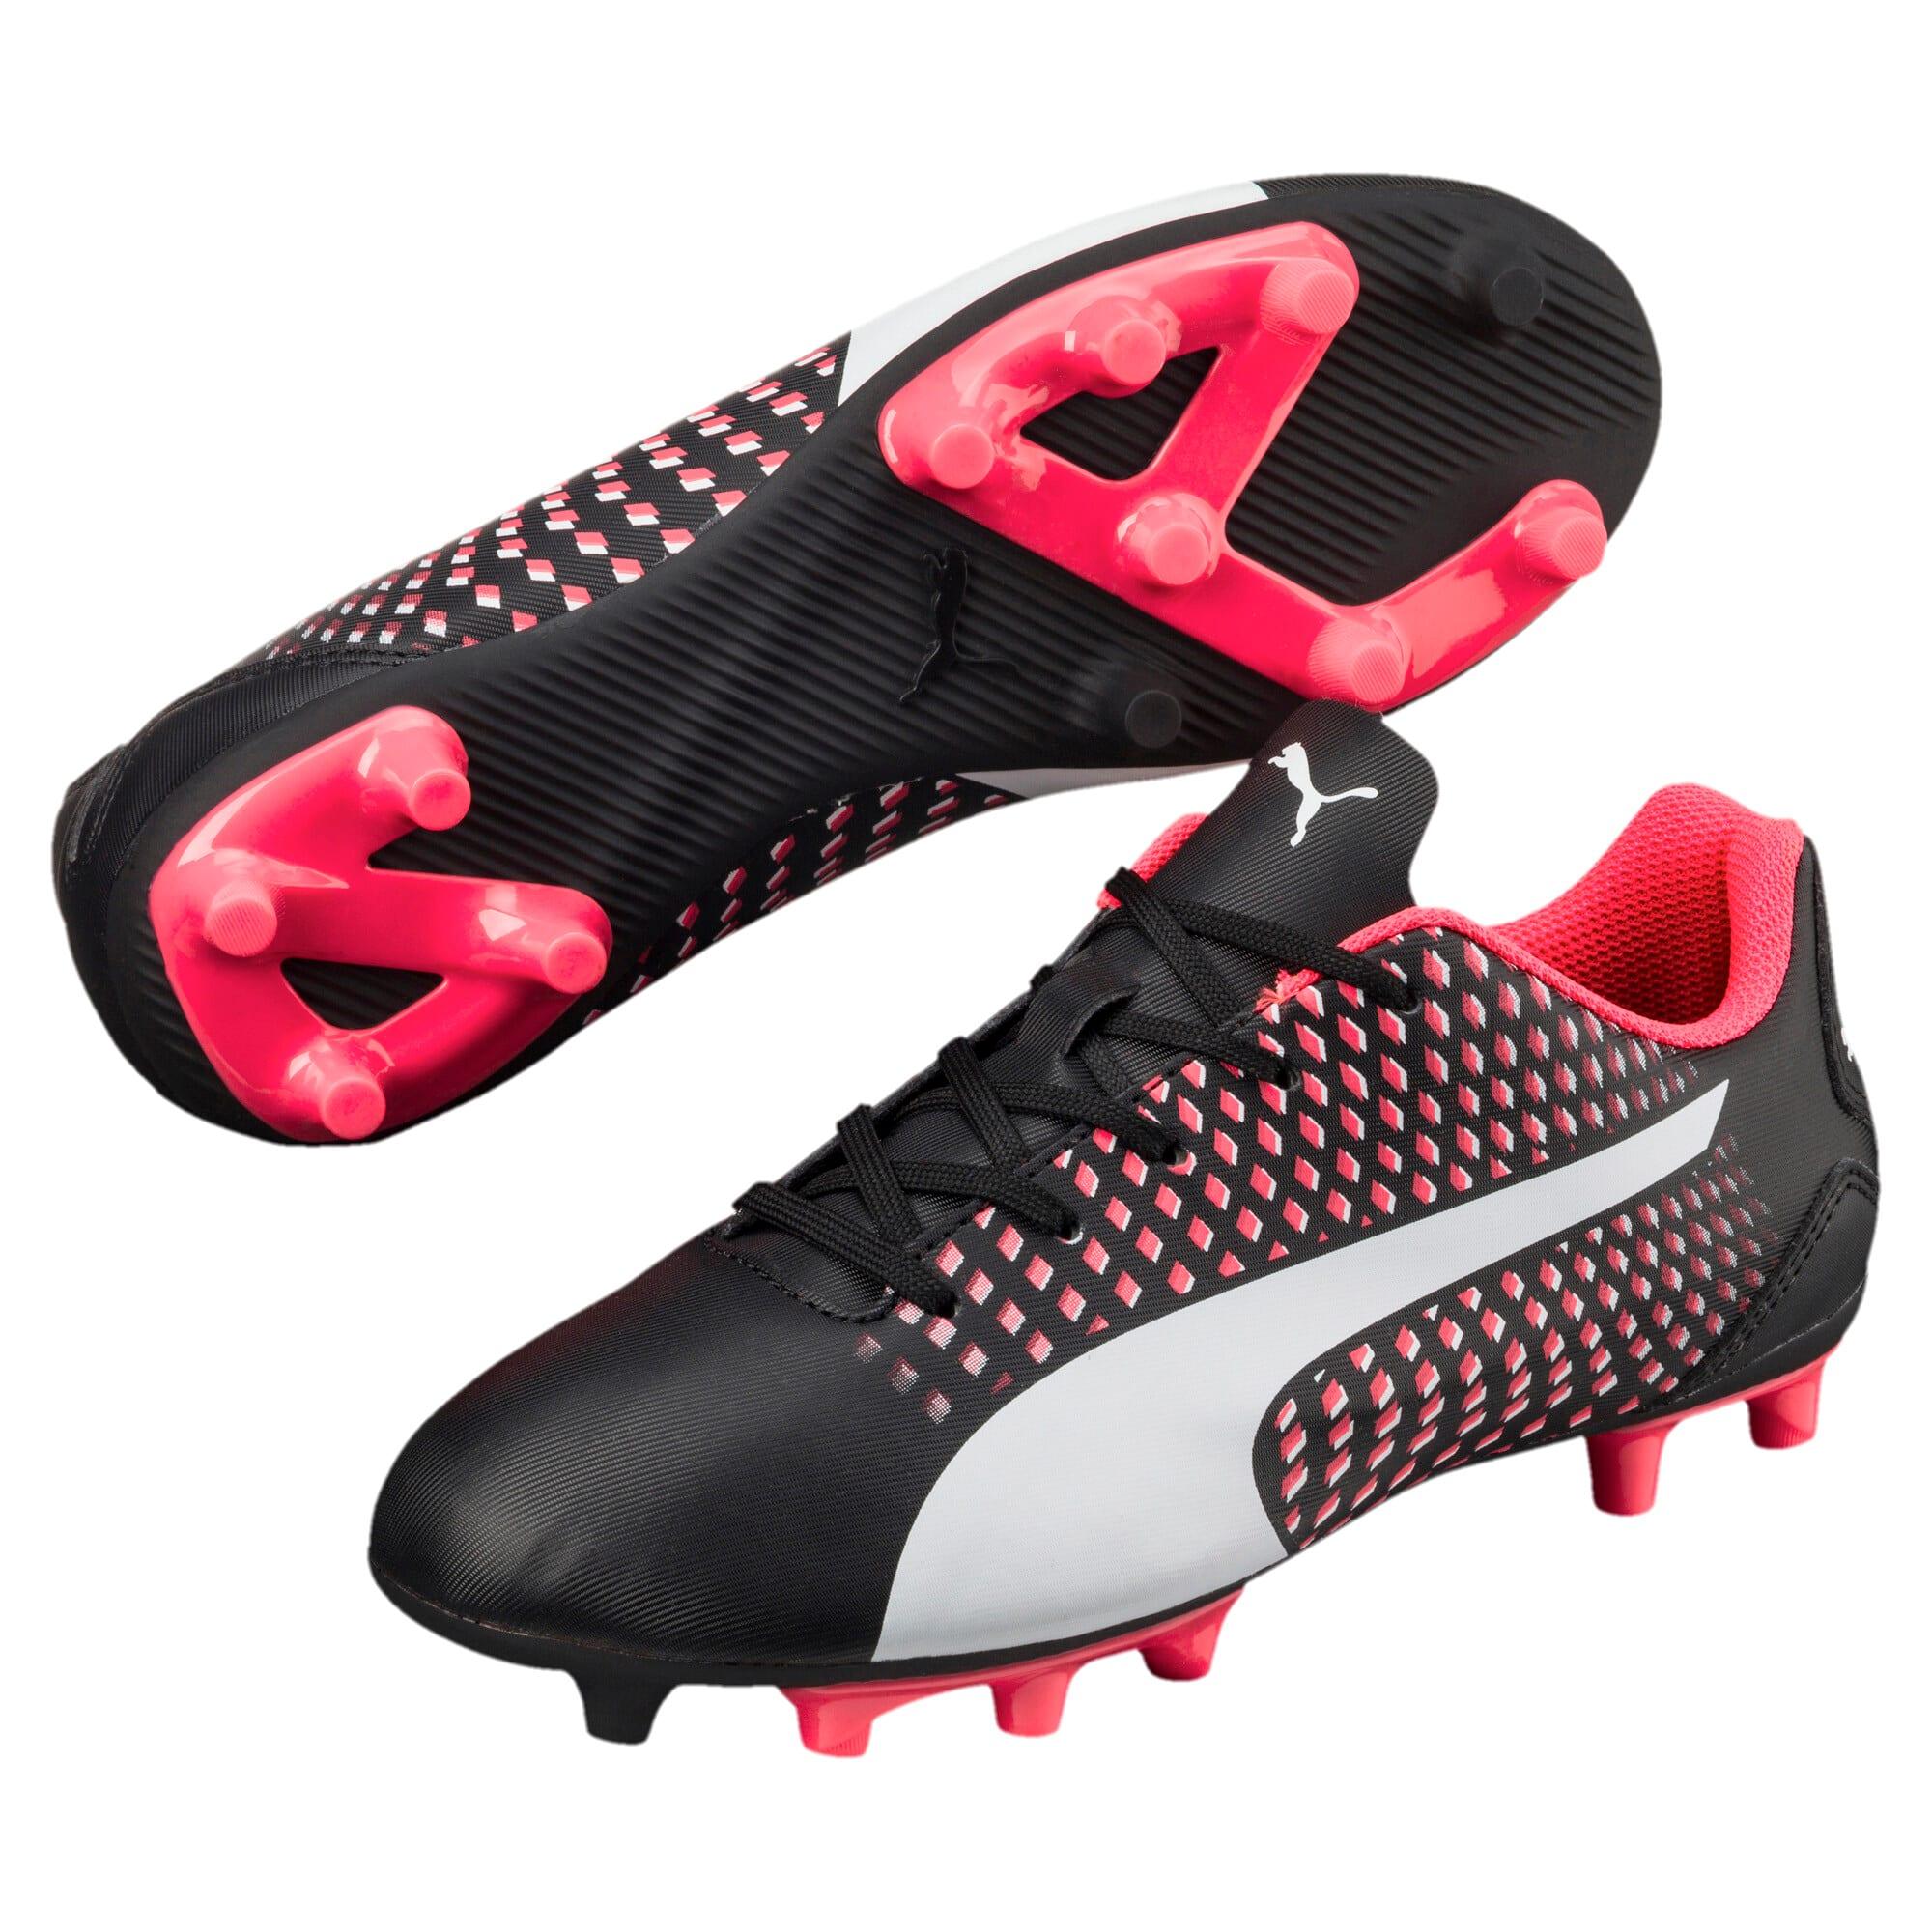 Thumbnail 2 of Adreno III FG Kids' Football Boots, black-white-plasma, medium-IND